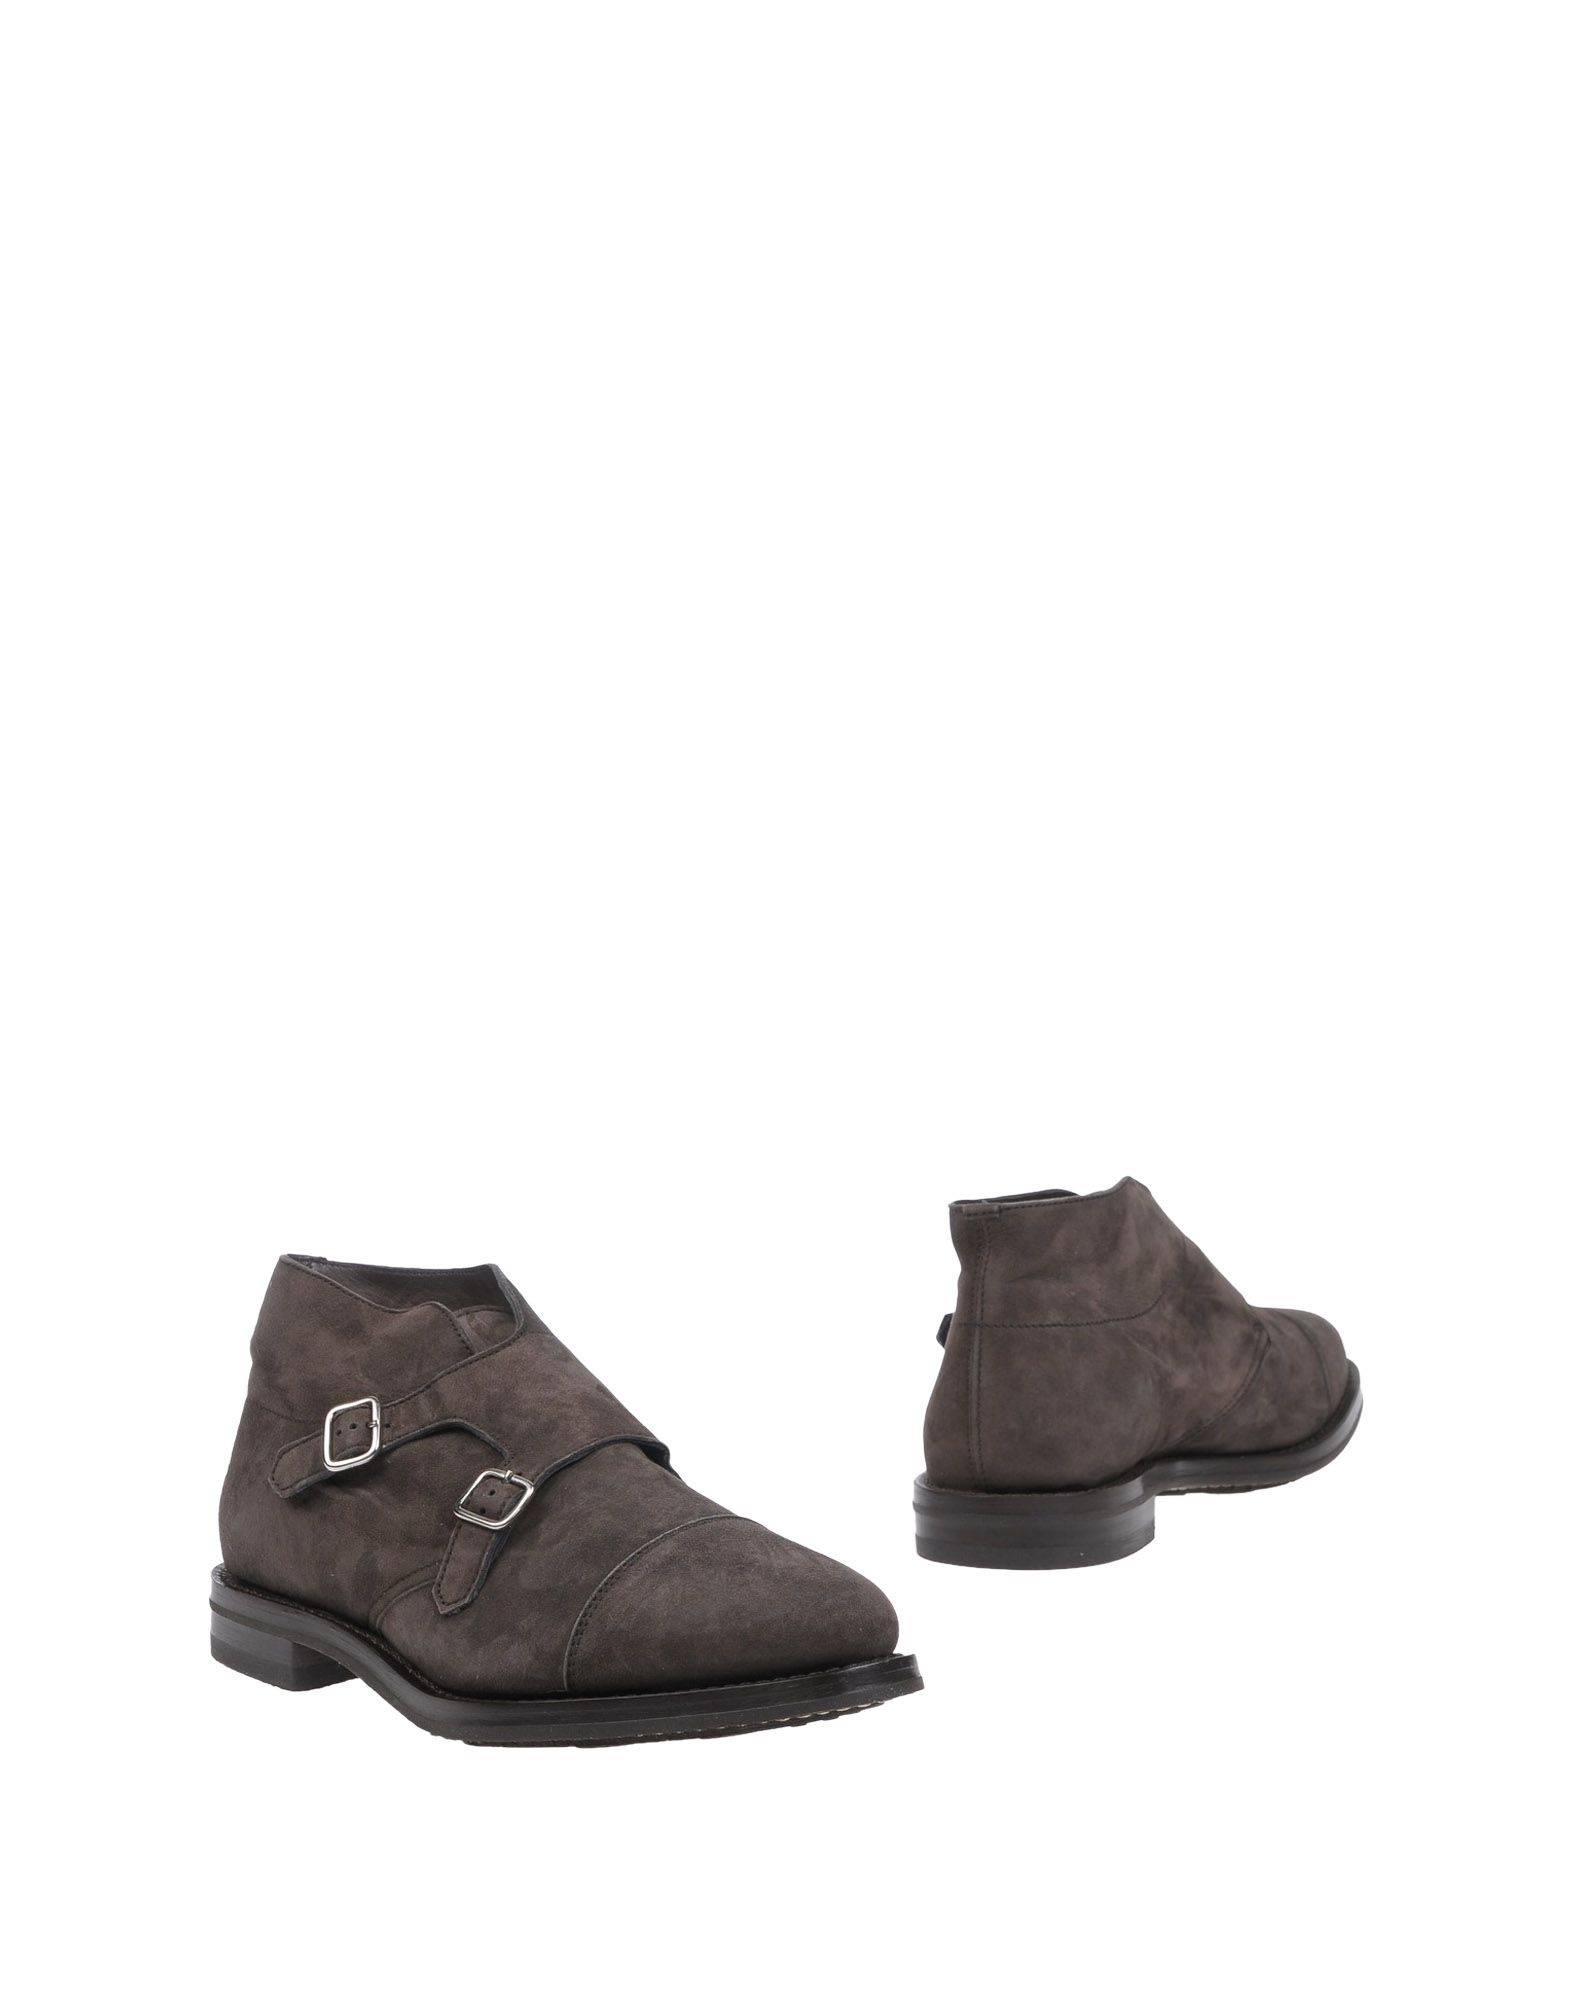 ANDREA VENTURA FIRENZE per EREDI CHIARINI Полусапоги и высокие ботинки eredi chiarini eredi chiarini галстук 154190